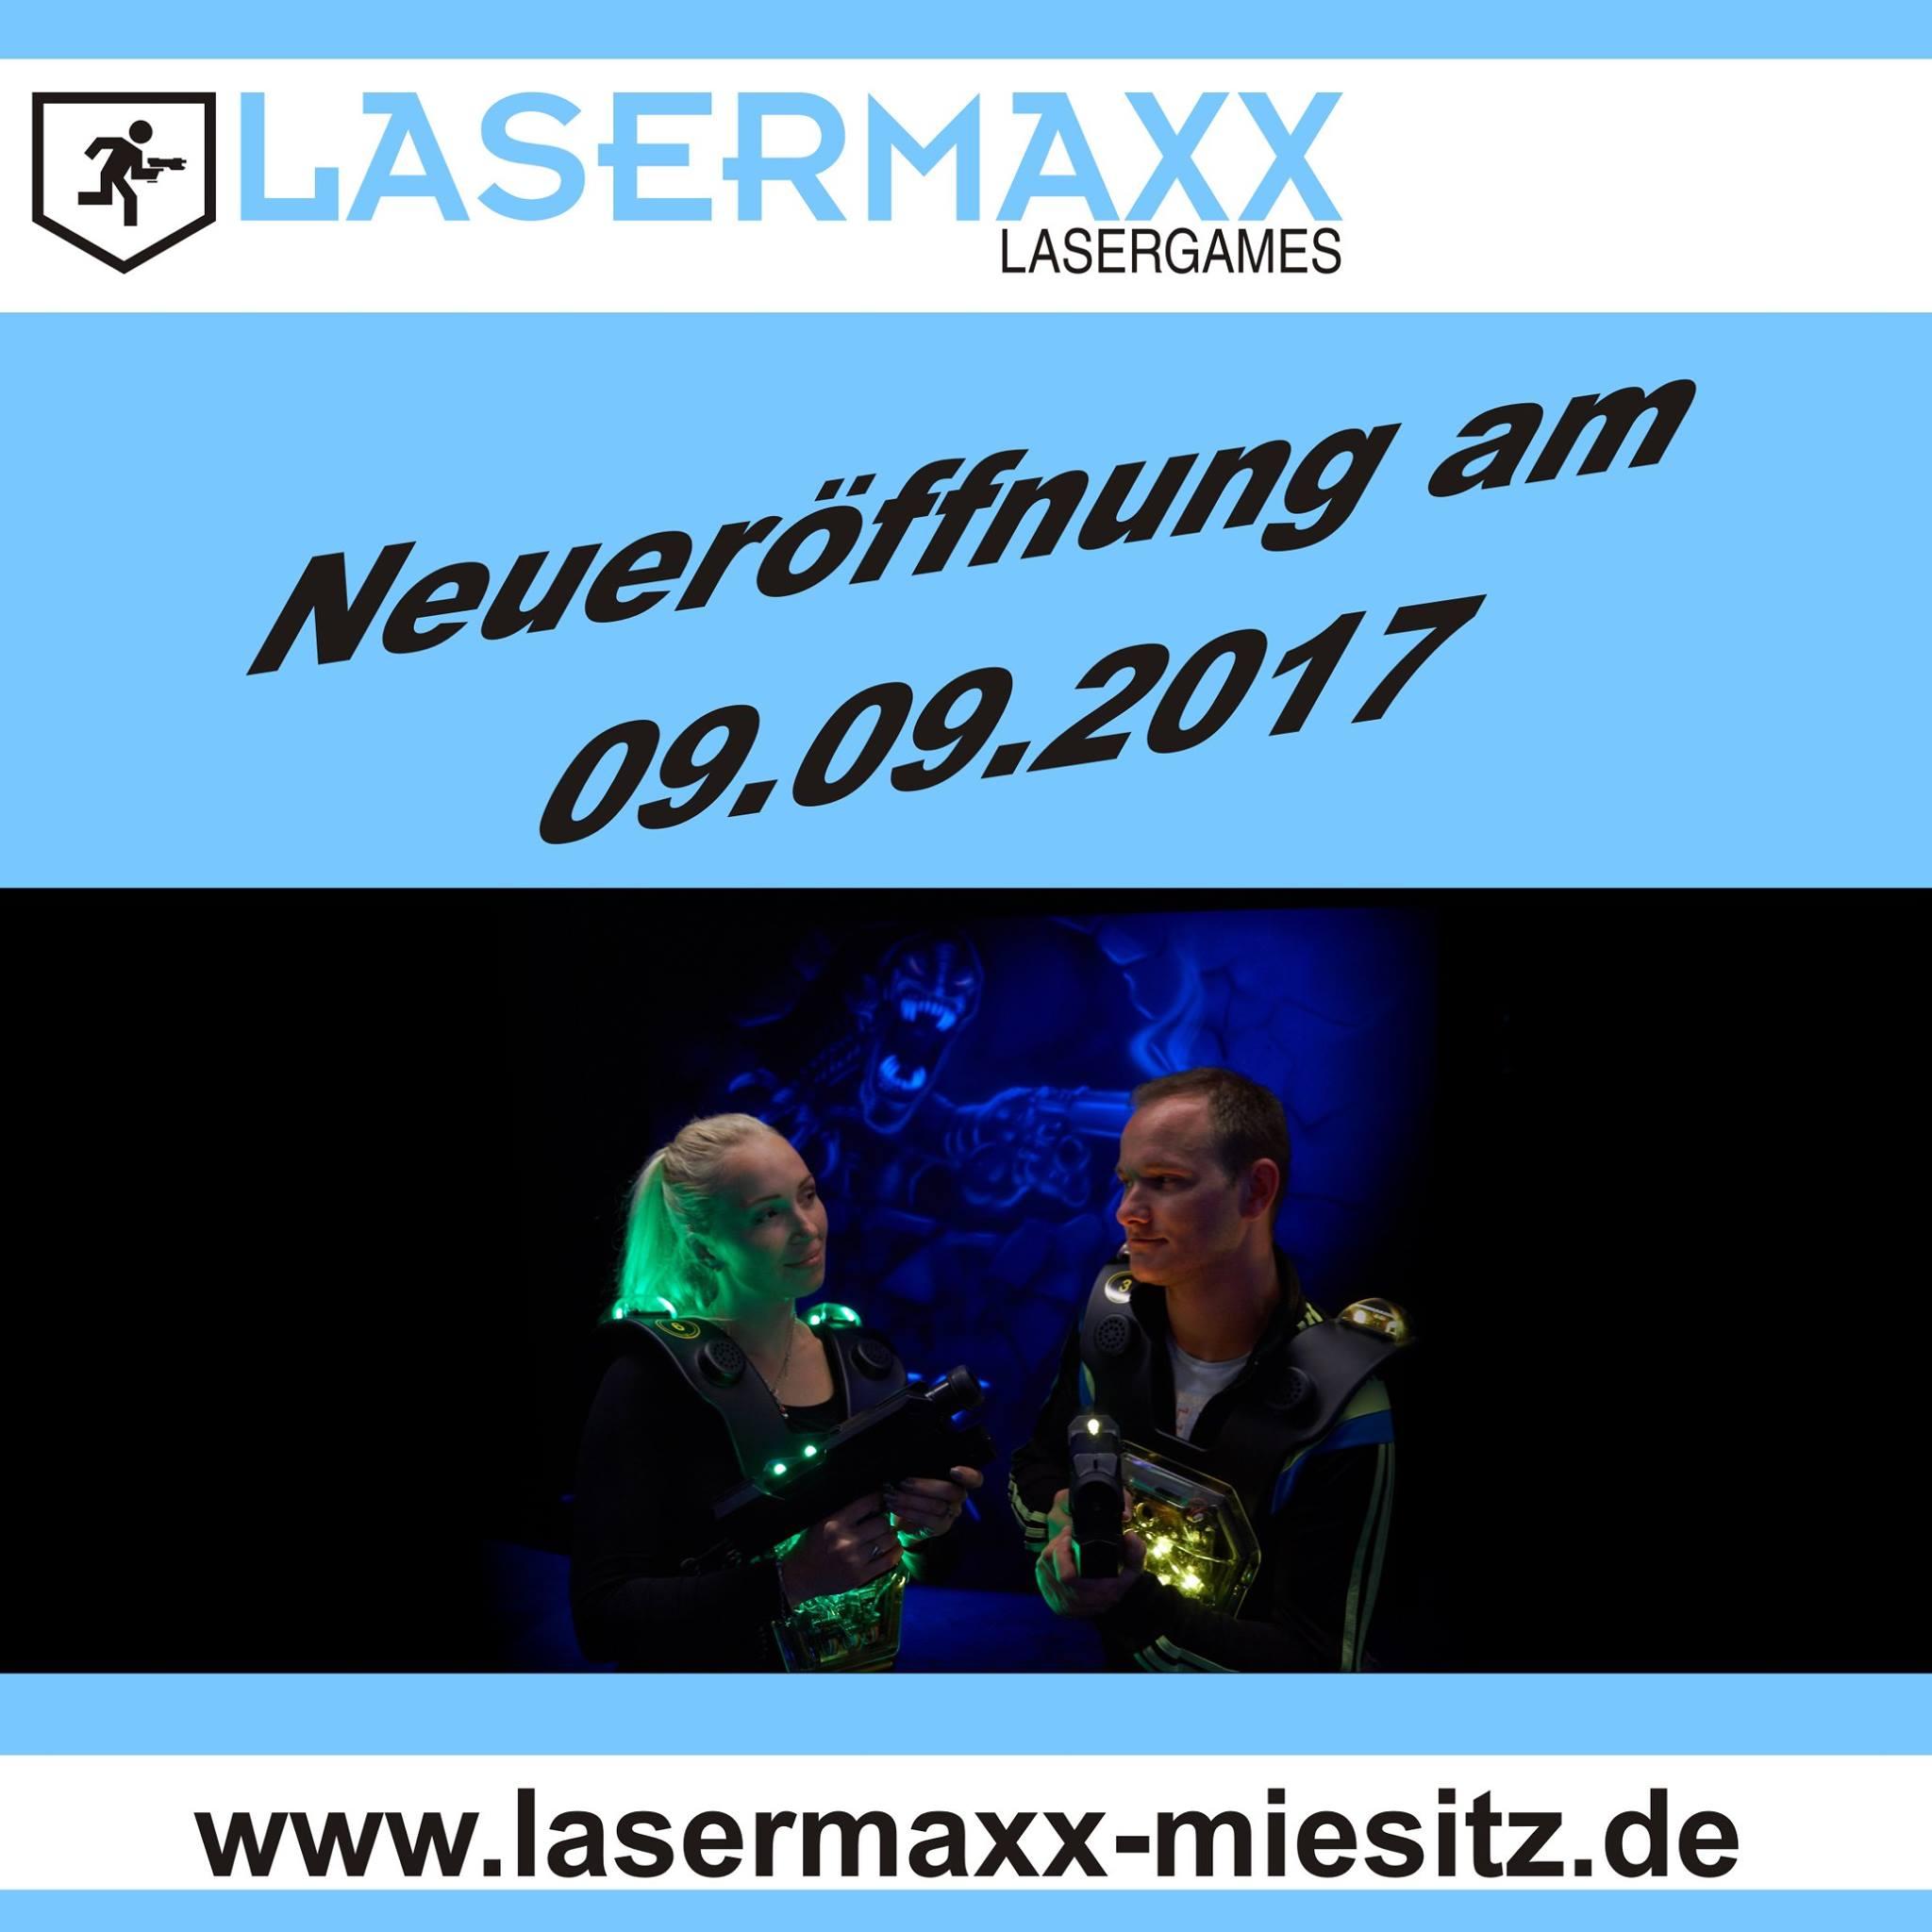 LaserMaxx Miesitz Lasertag Lasertagfans